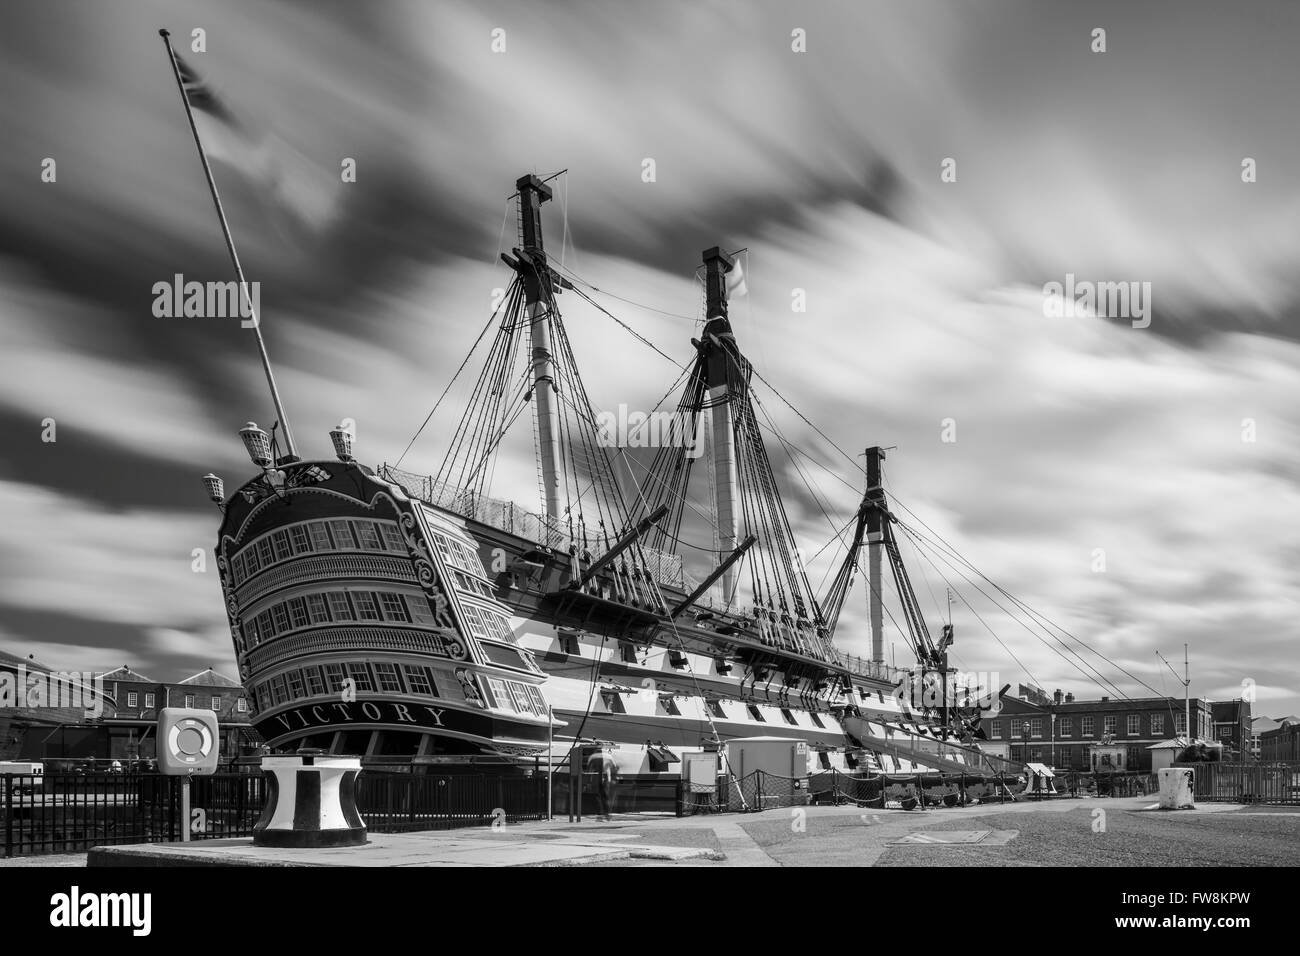 HMS Victory historic Royal Navy ship in Portsmouth Historic Dockyard, UK. - Stock Image